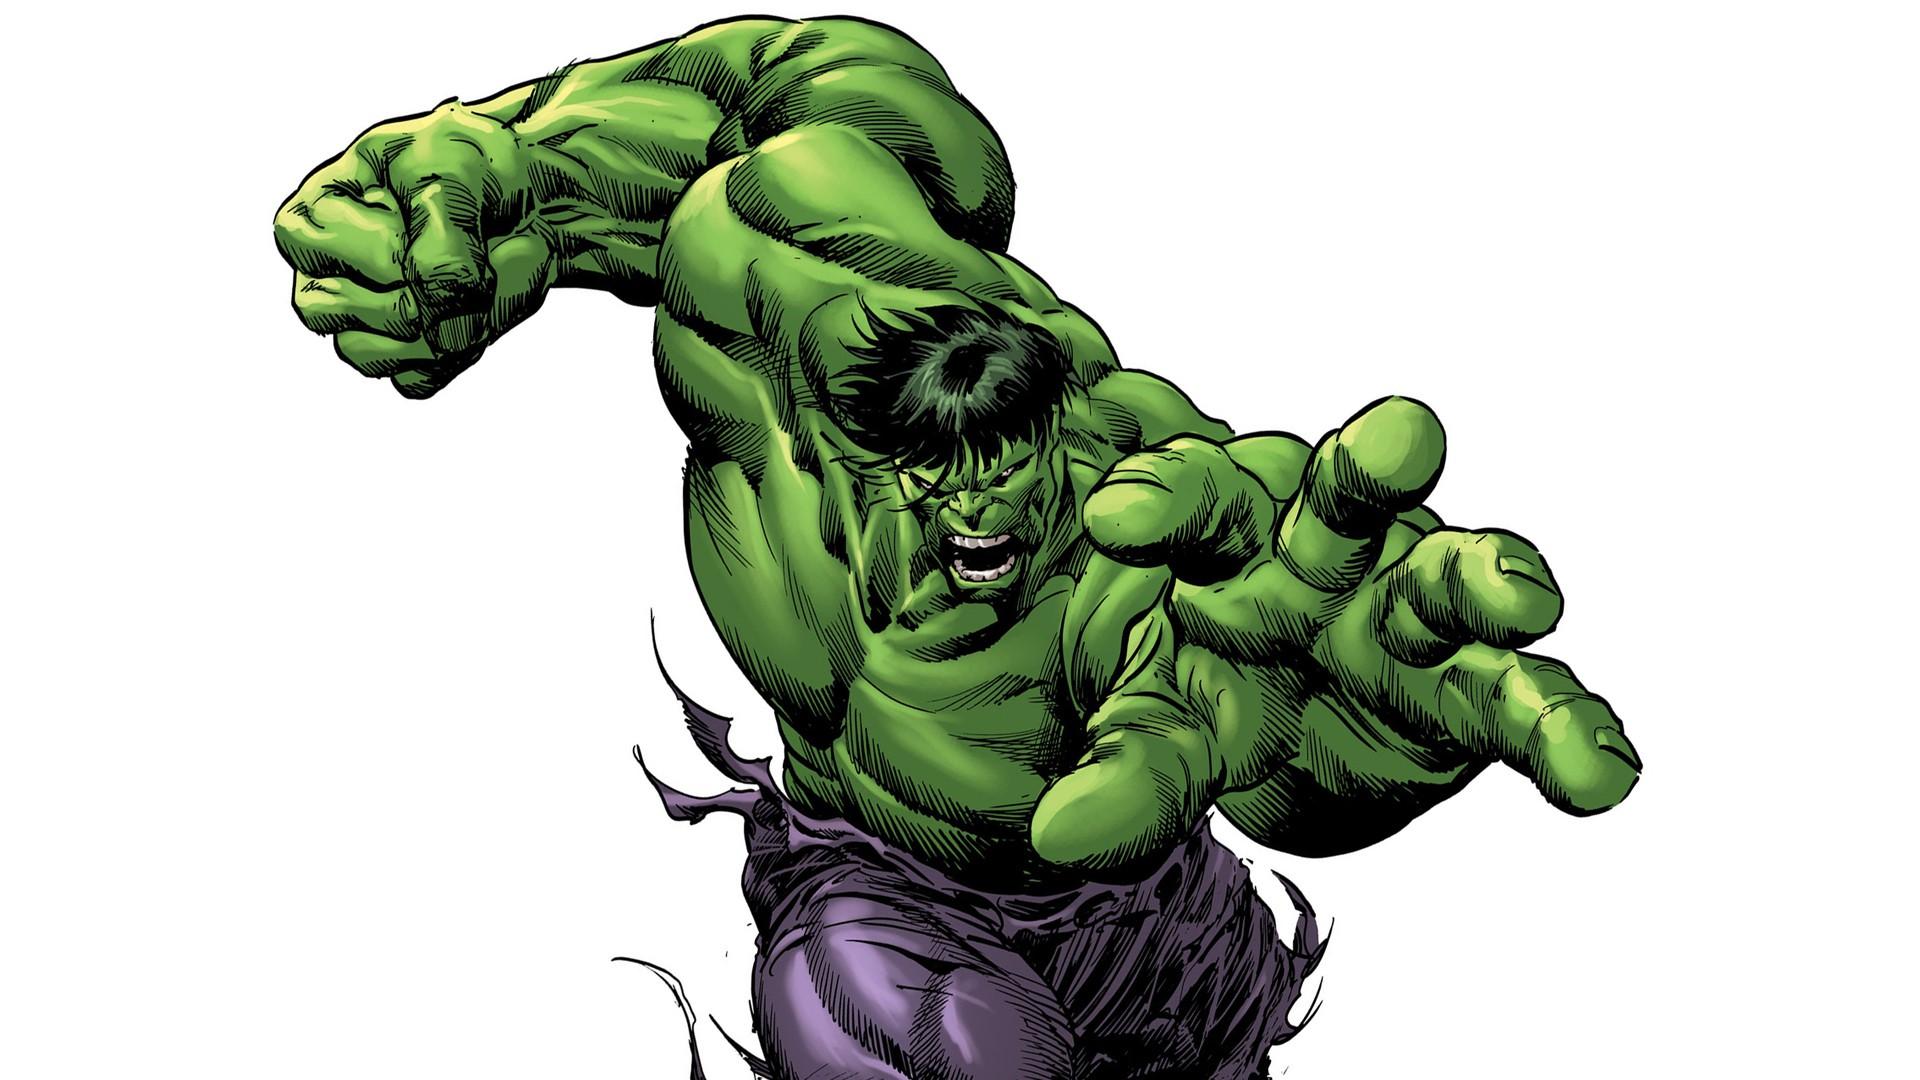 Hulk hd wallpaper background image 1920x1080 id - Hulk hd images free download ...